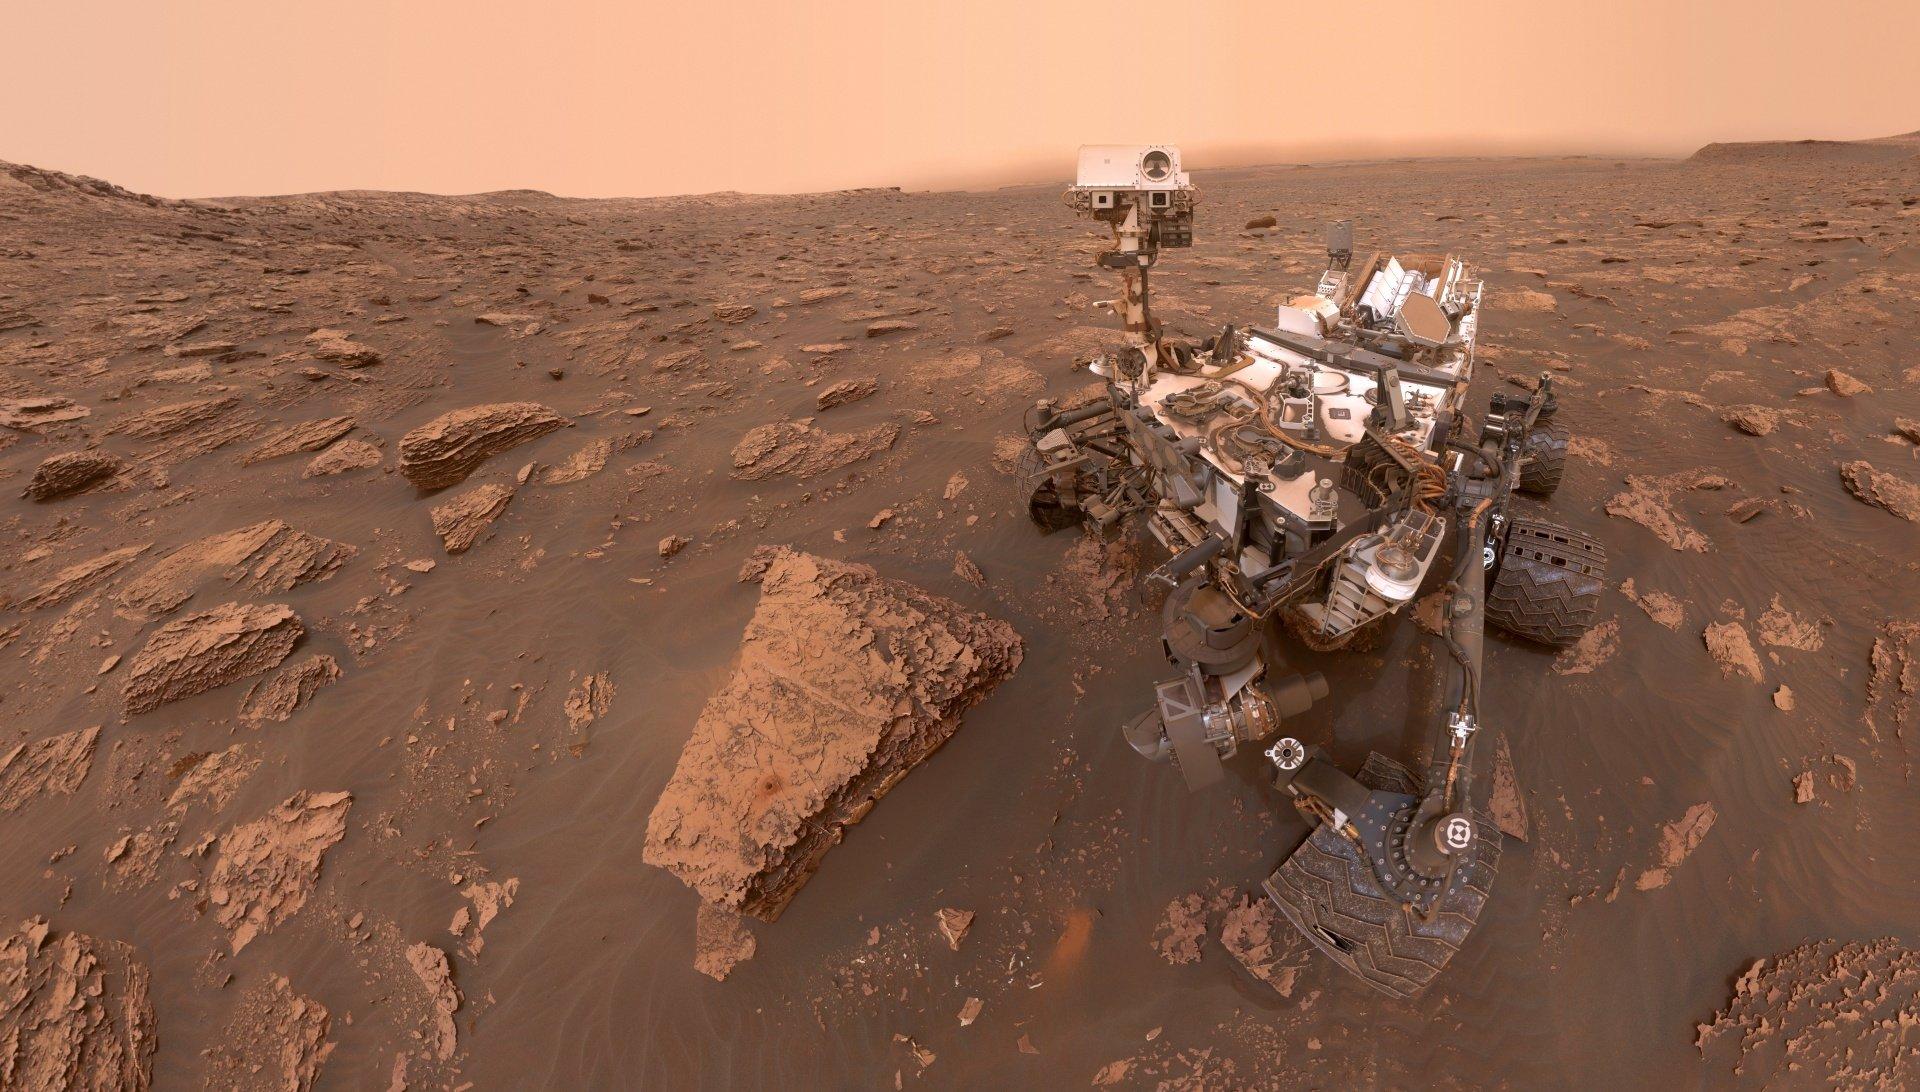 Nečekaný objev: krajinu Marsu nevytvořila voda. Rudá planeta připomíná Kanadu